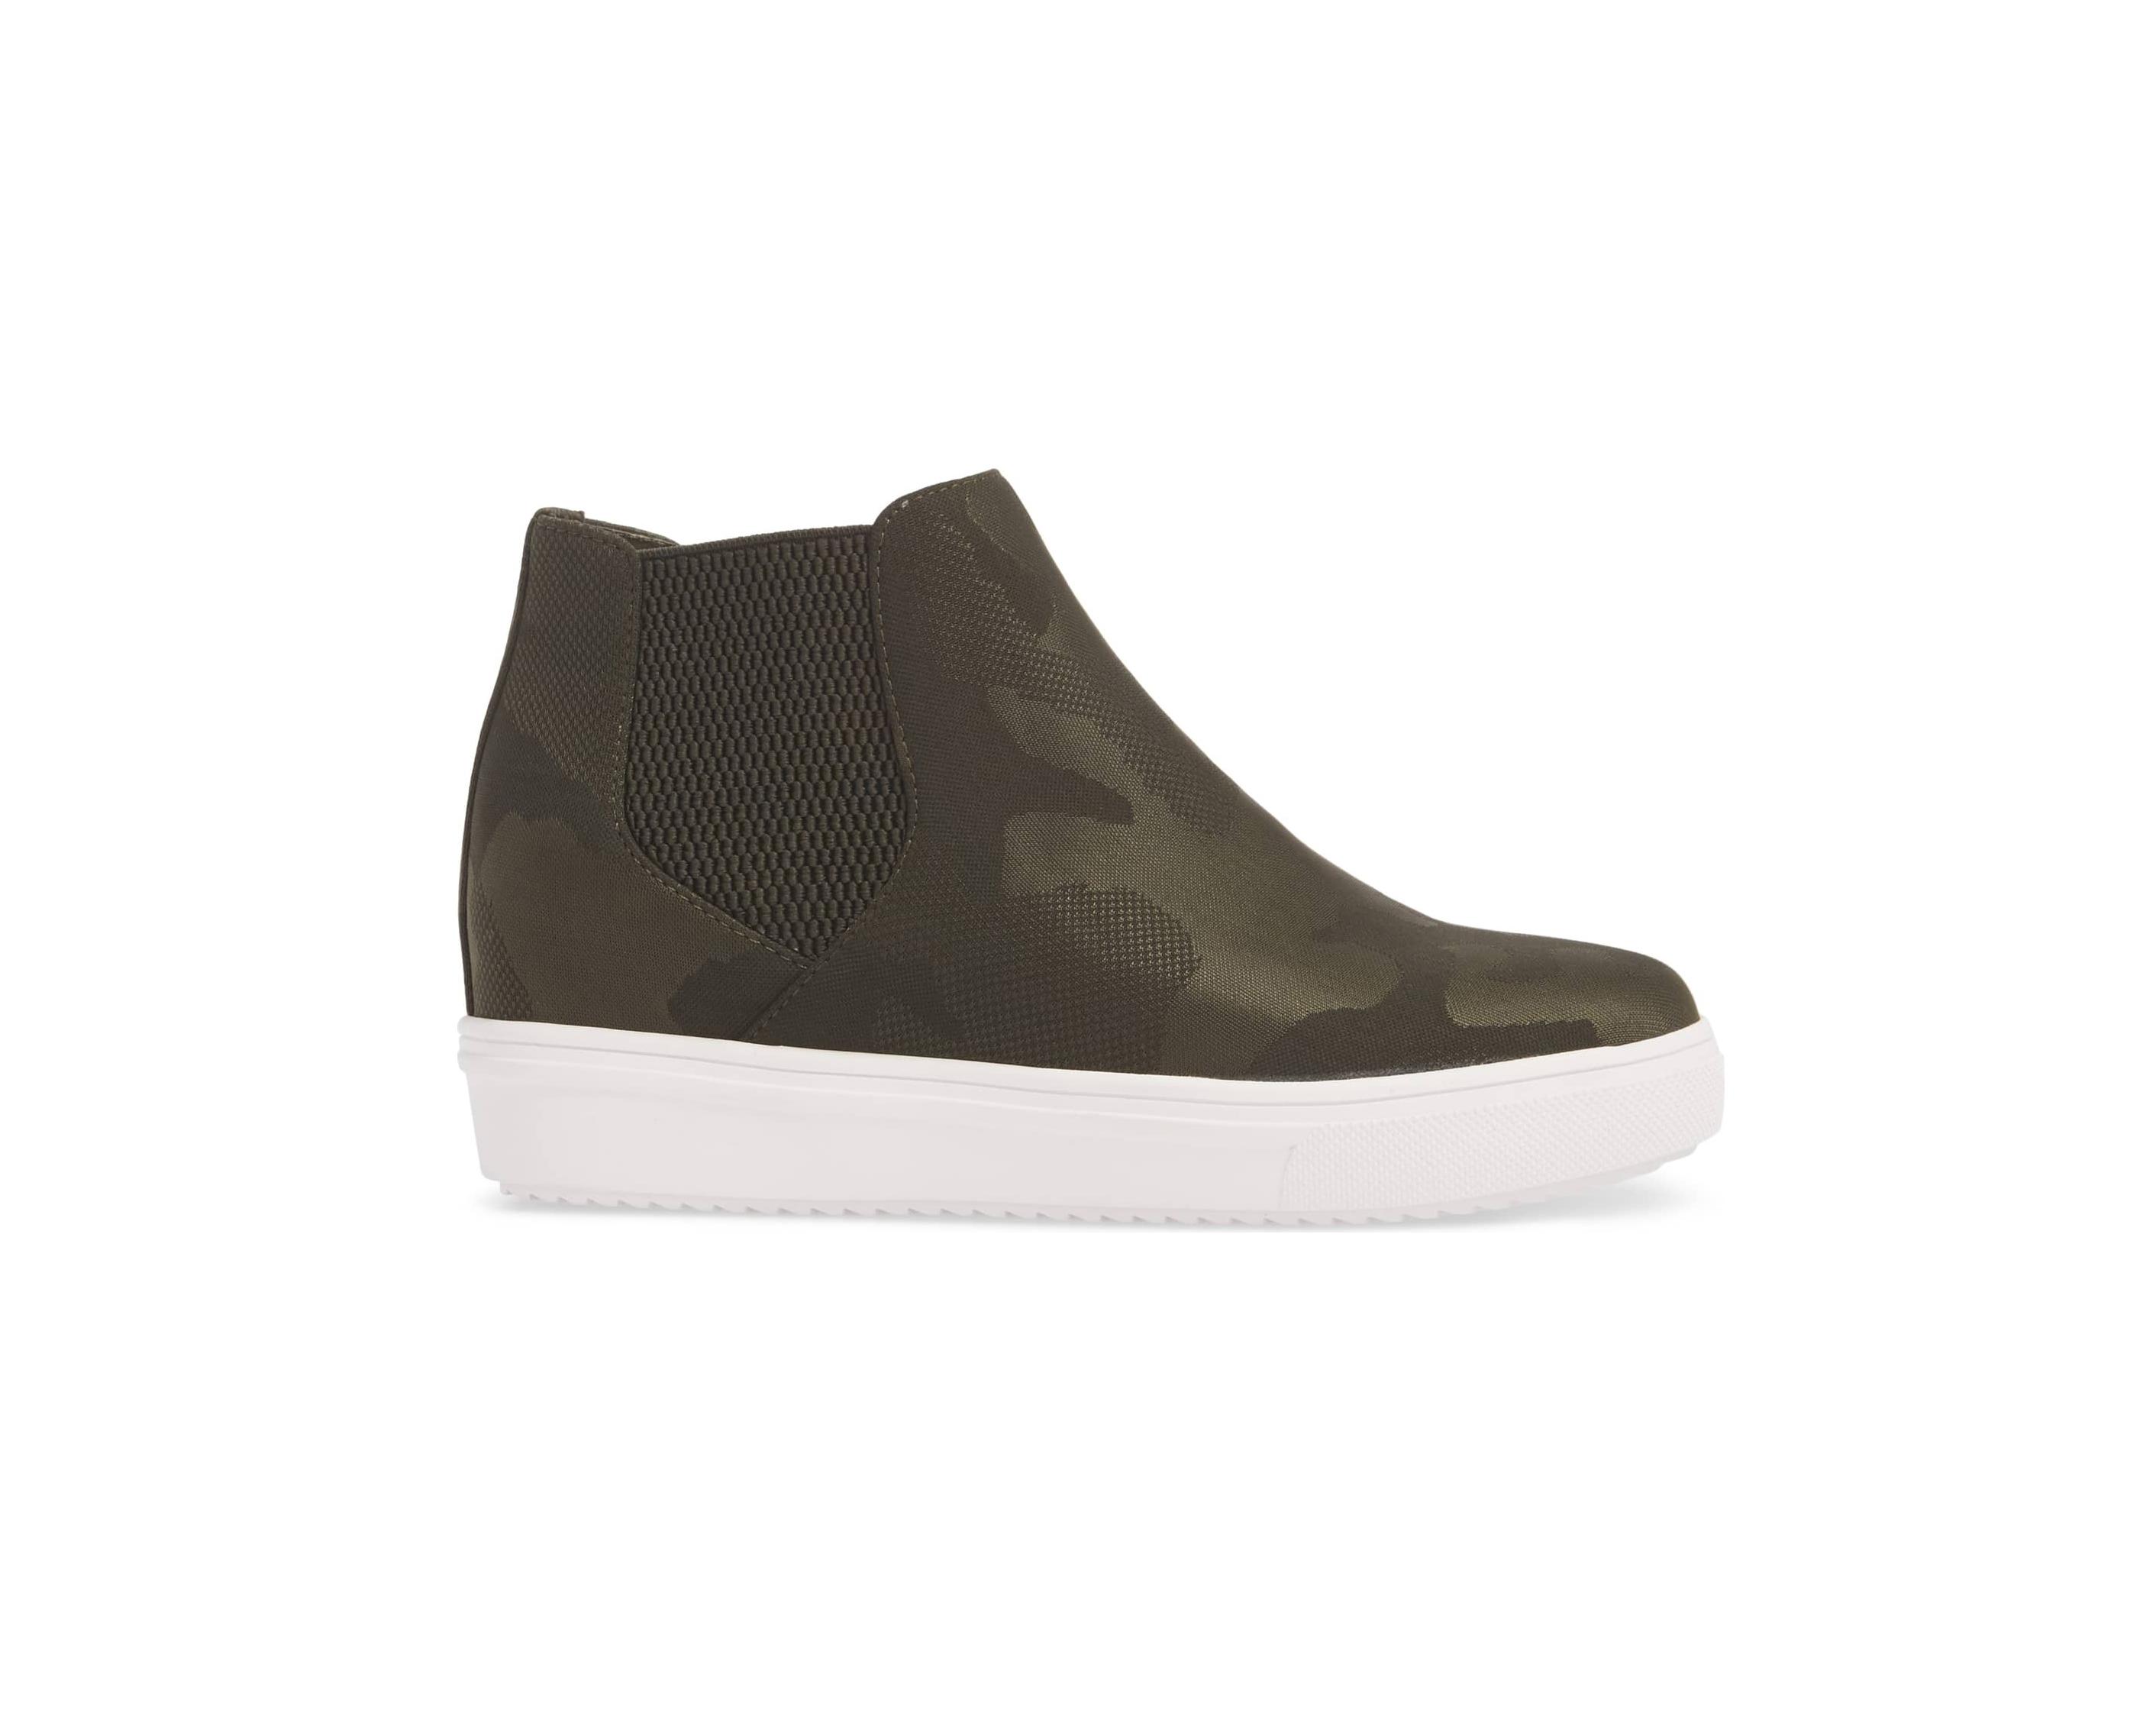 Shop Steve Madden Wedge Sneakers on